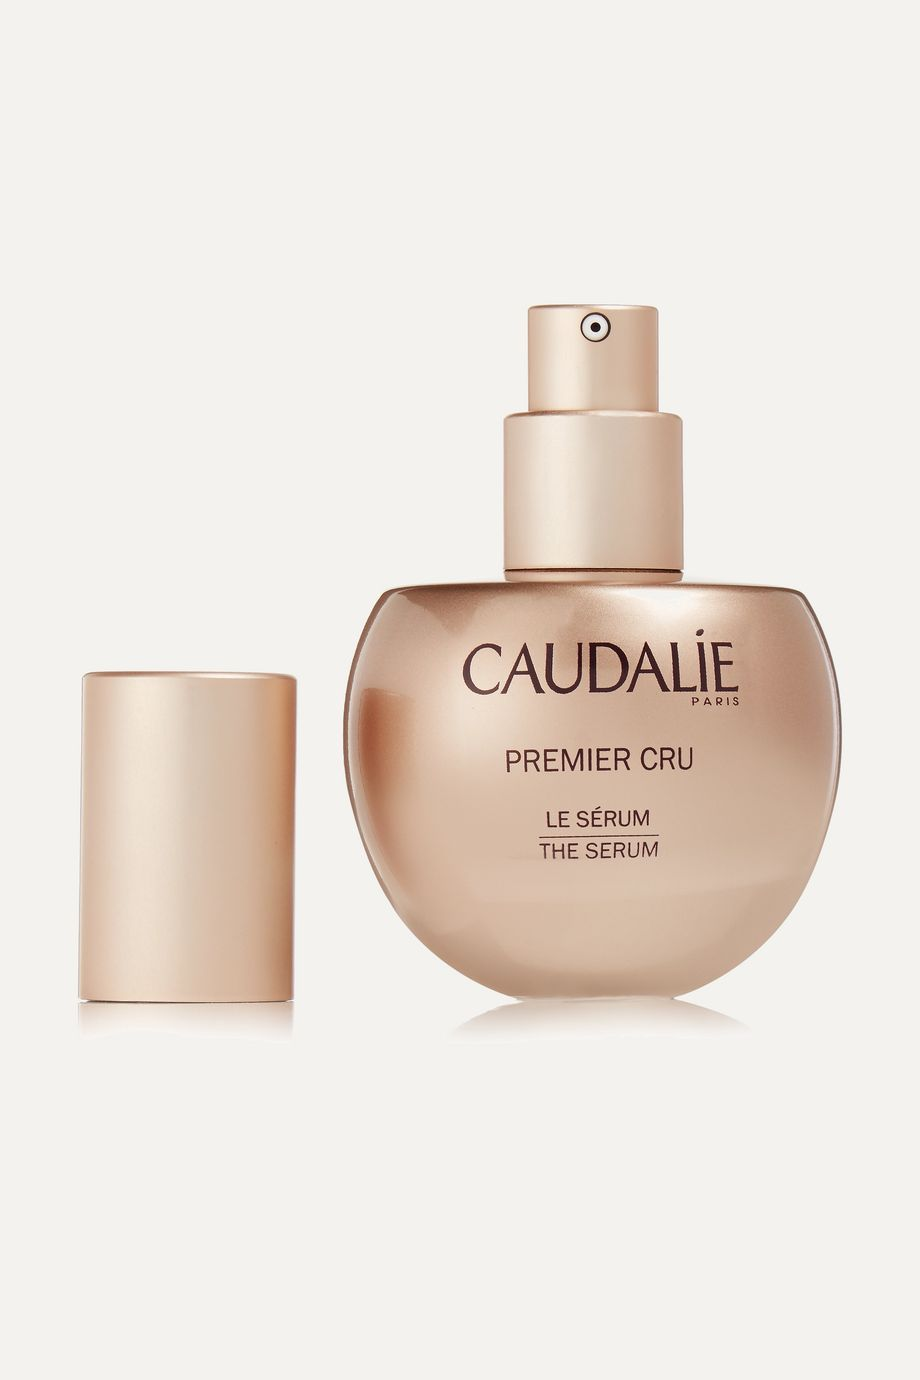 Caudalie Premier Cru The Serum, 30ml